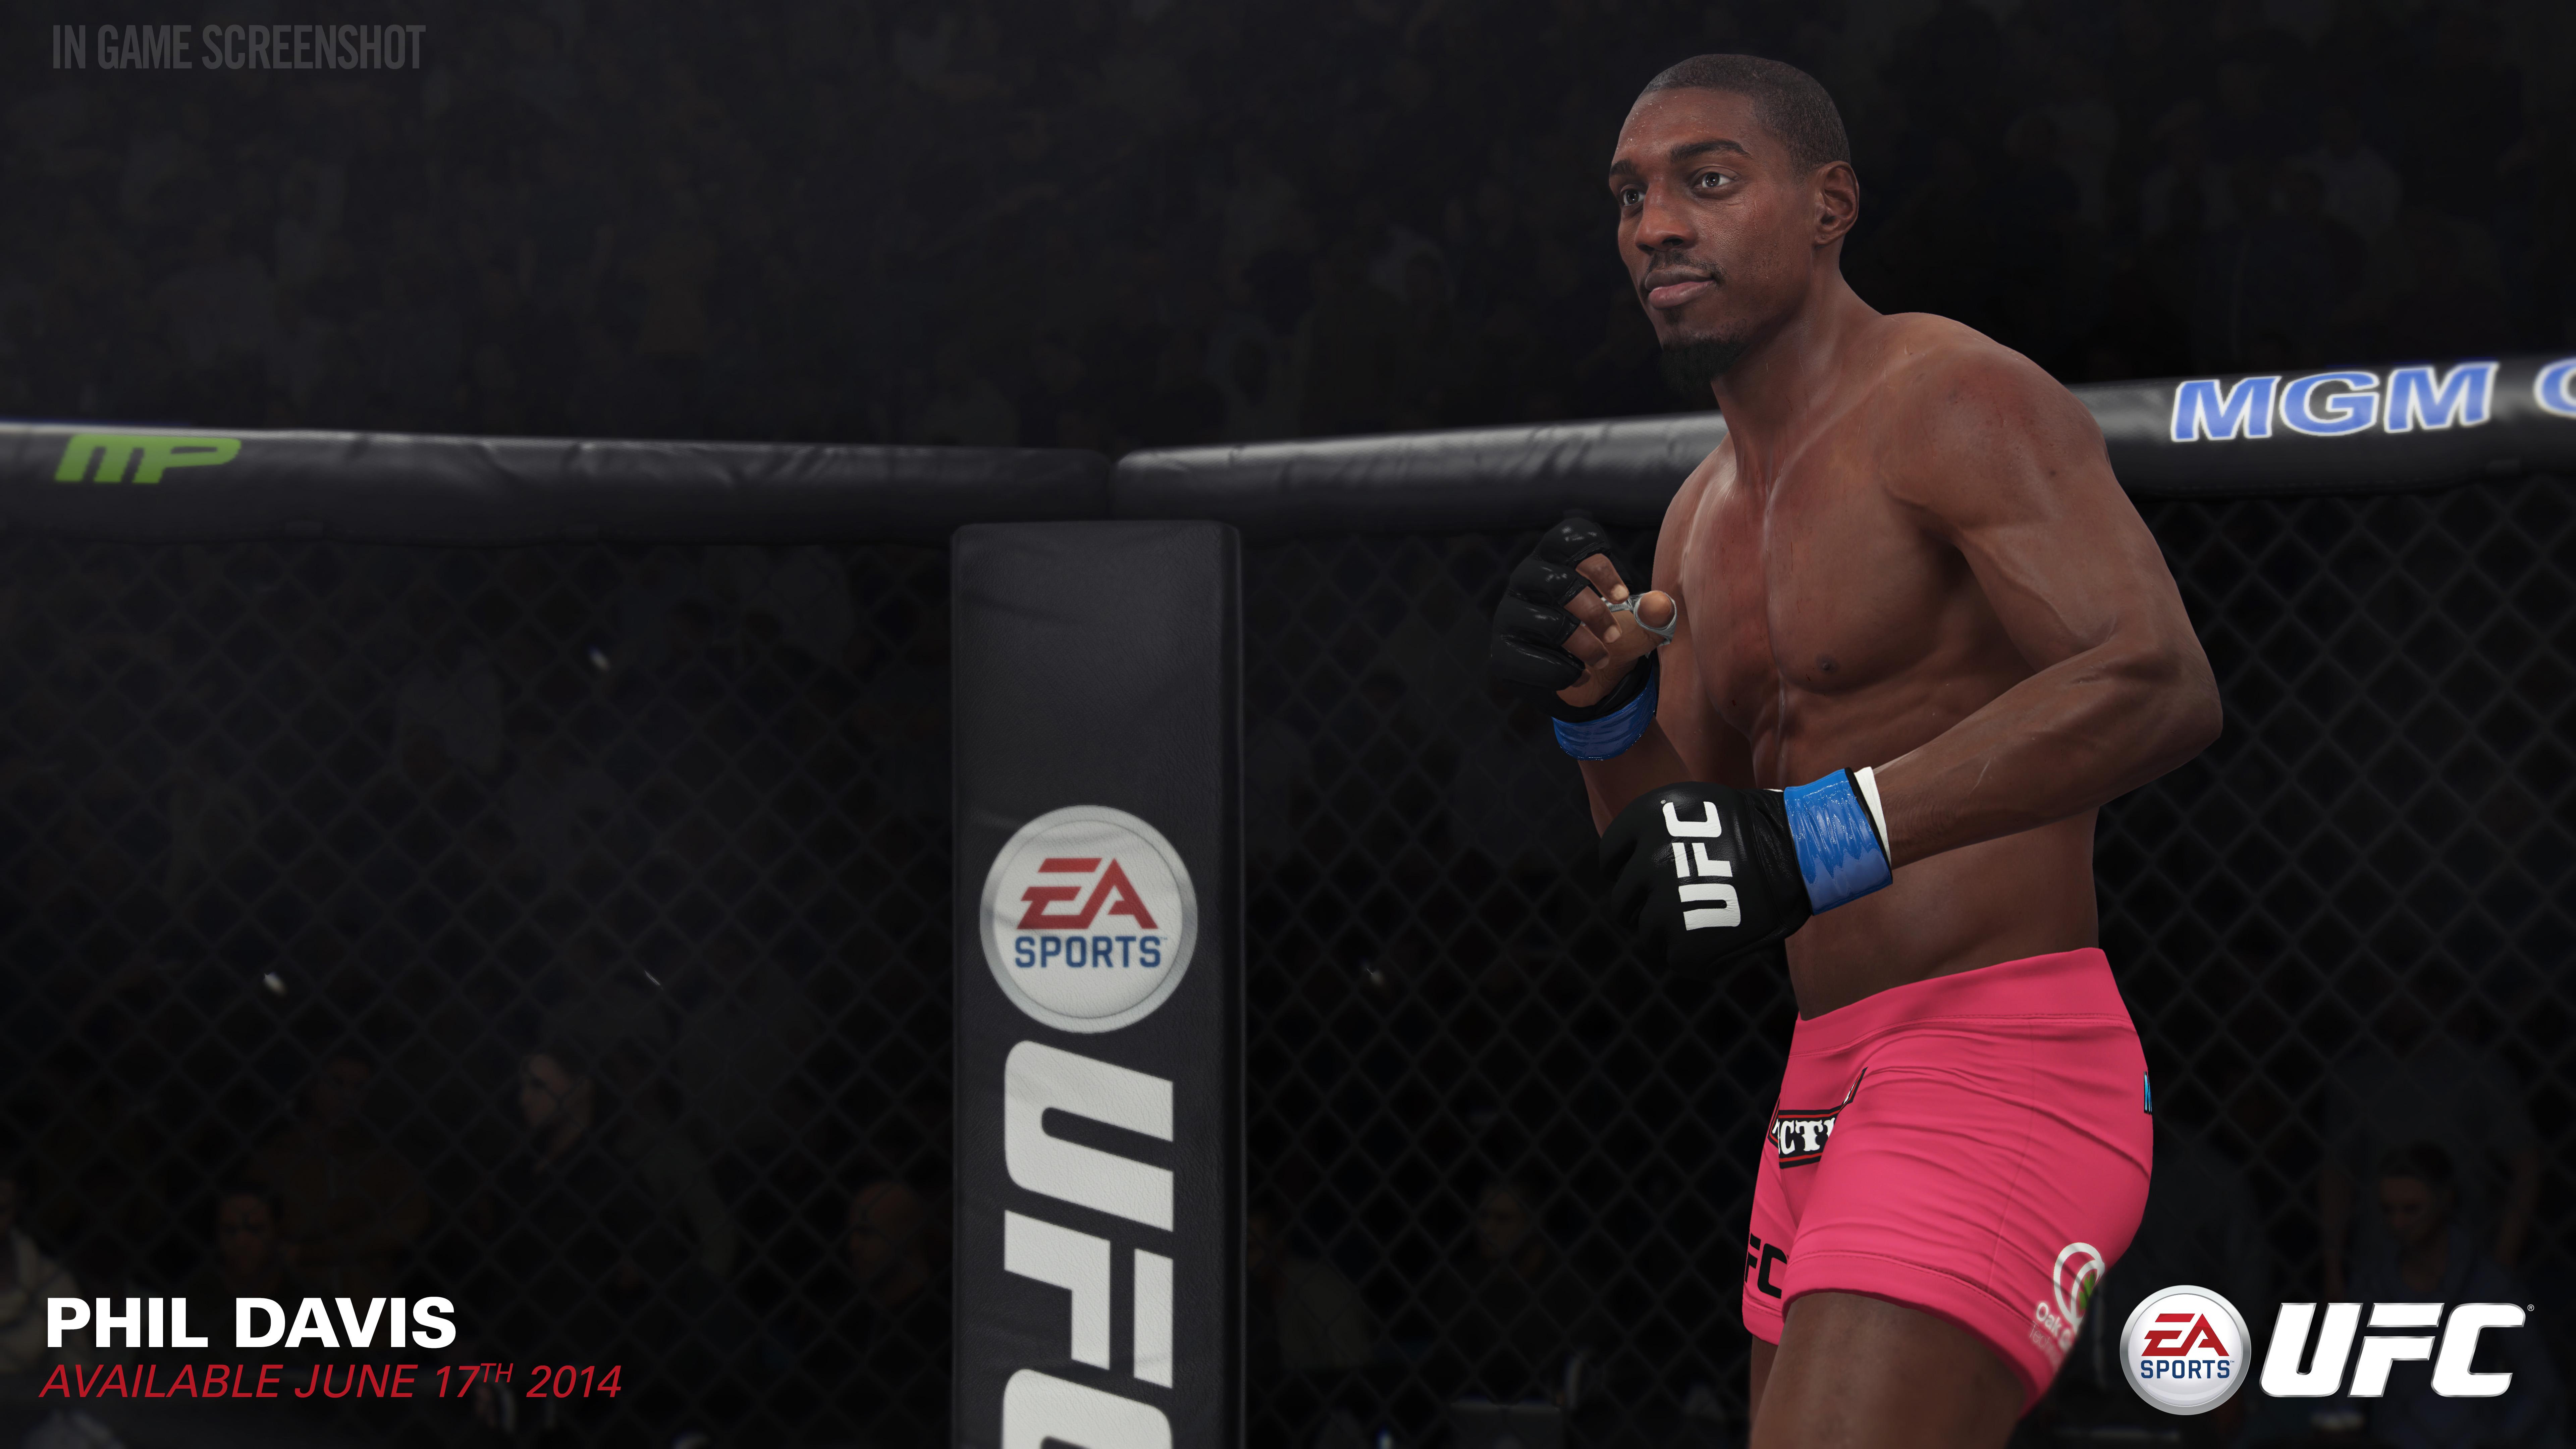 Фил Дэвис - EA Sports UFC 8K